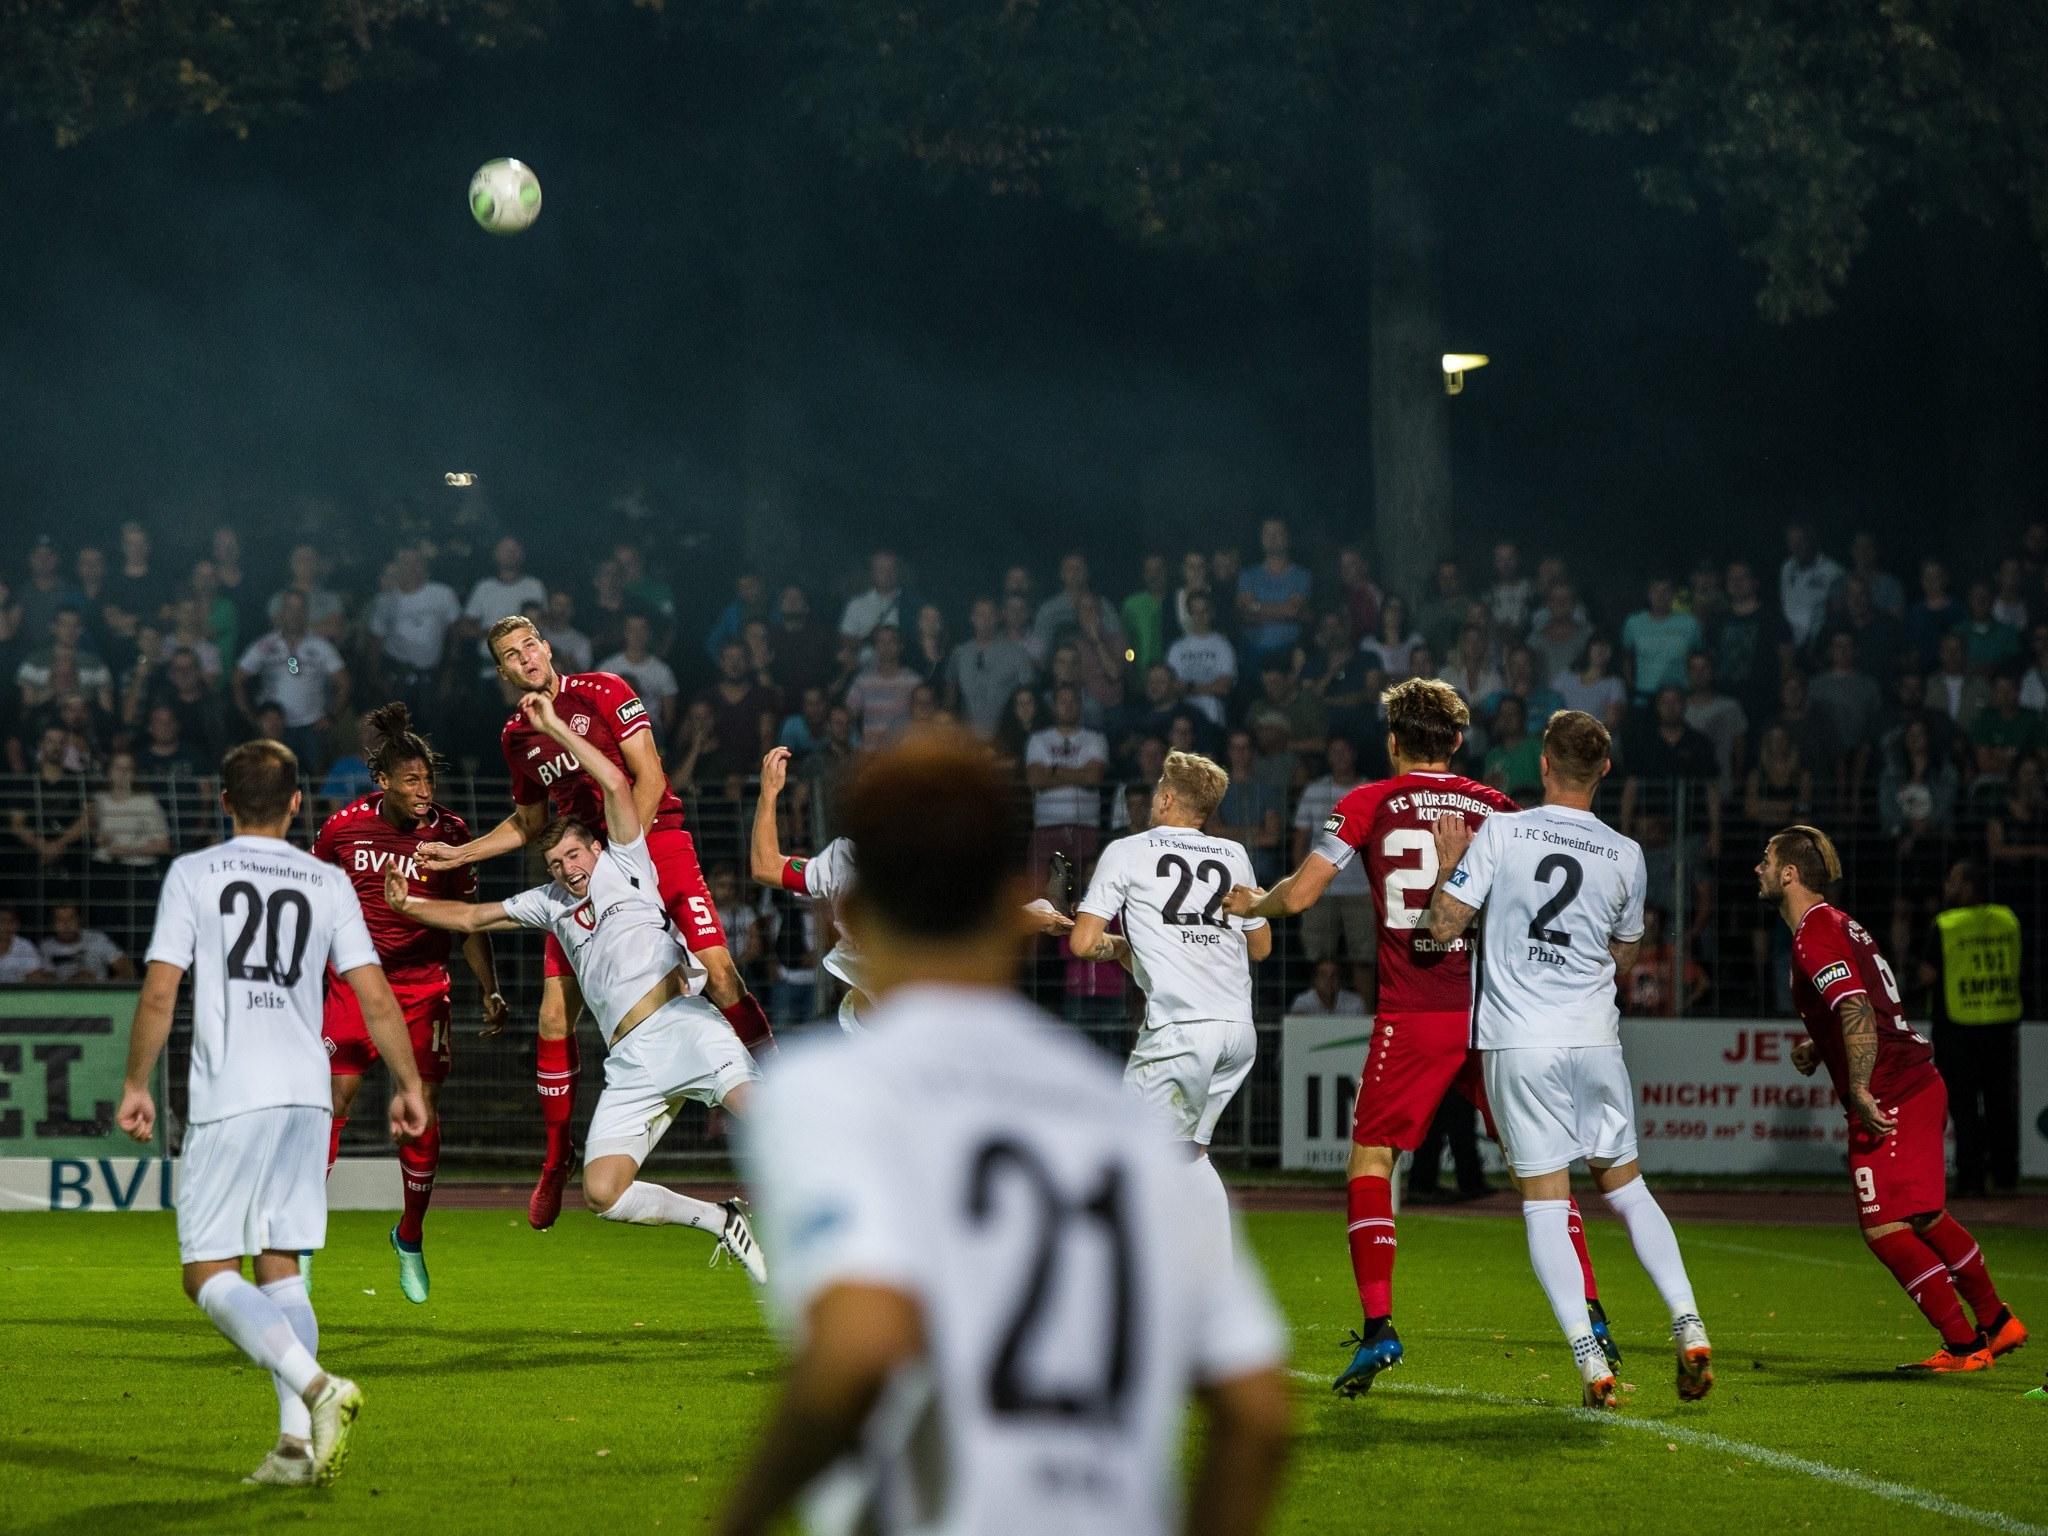 Fußball in Schweinfurt. Symbolfoto: Pascal Höfig